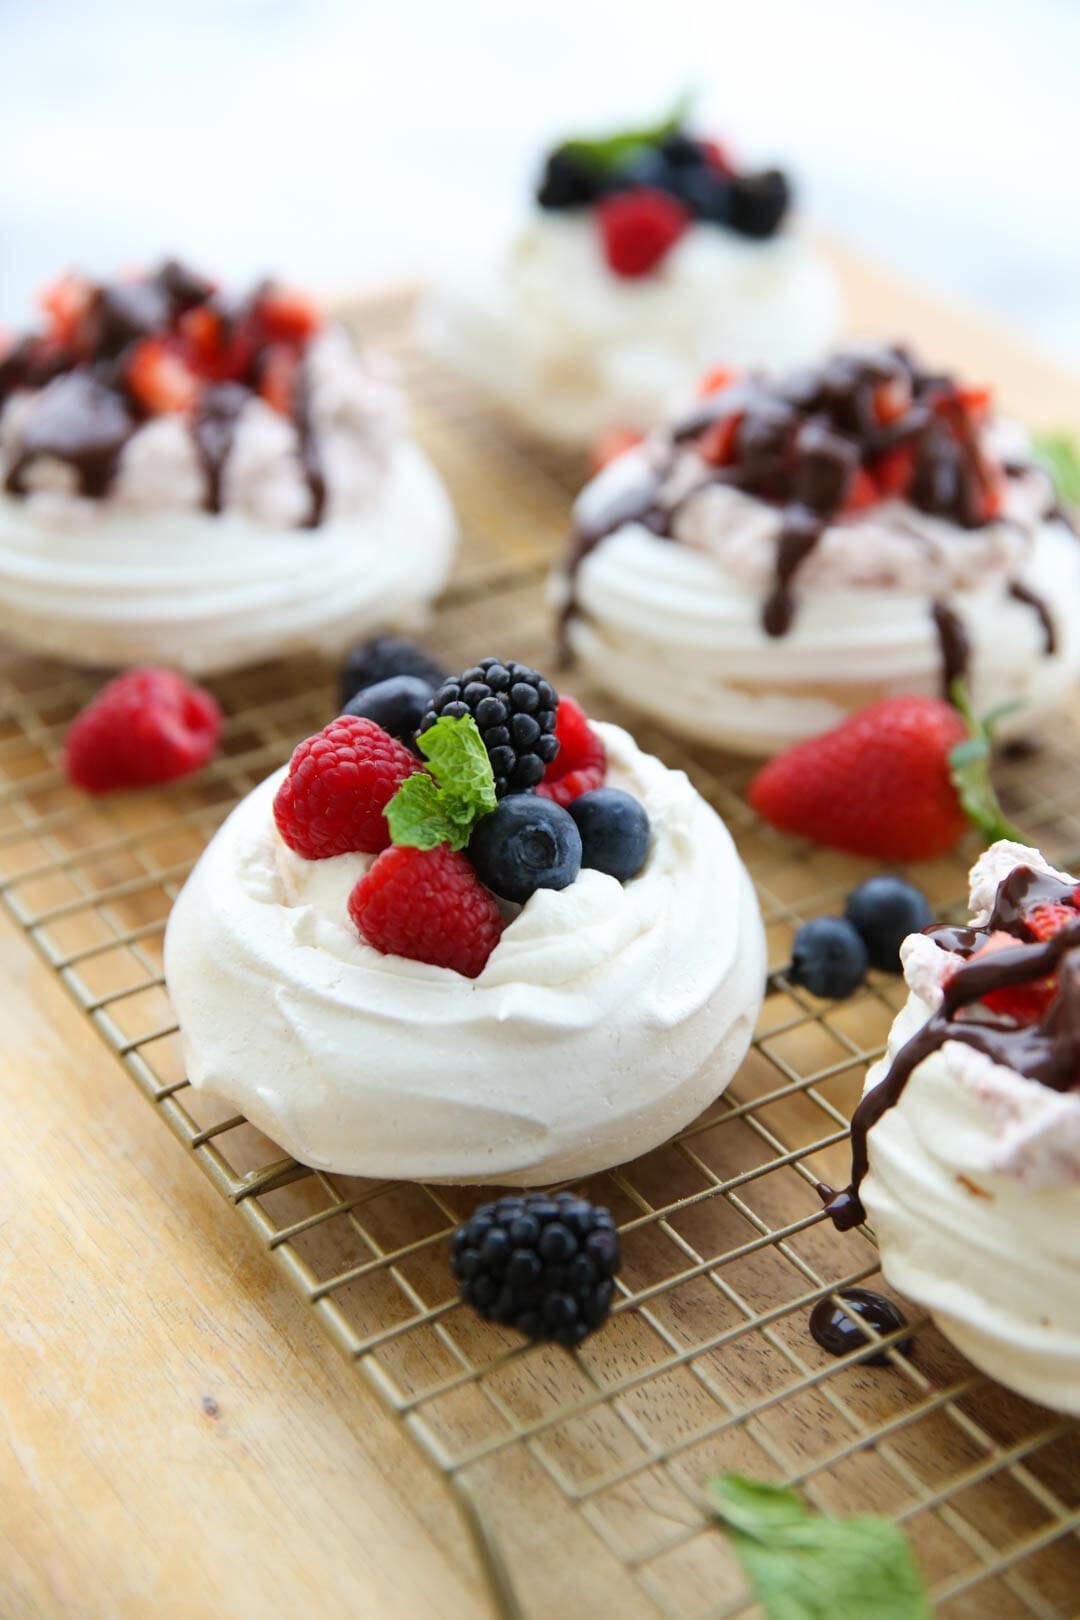 Pavlova Dessert Recipe  Easy Pavlova Recipe with Berries and Cream